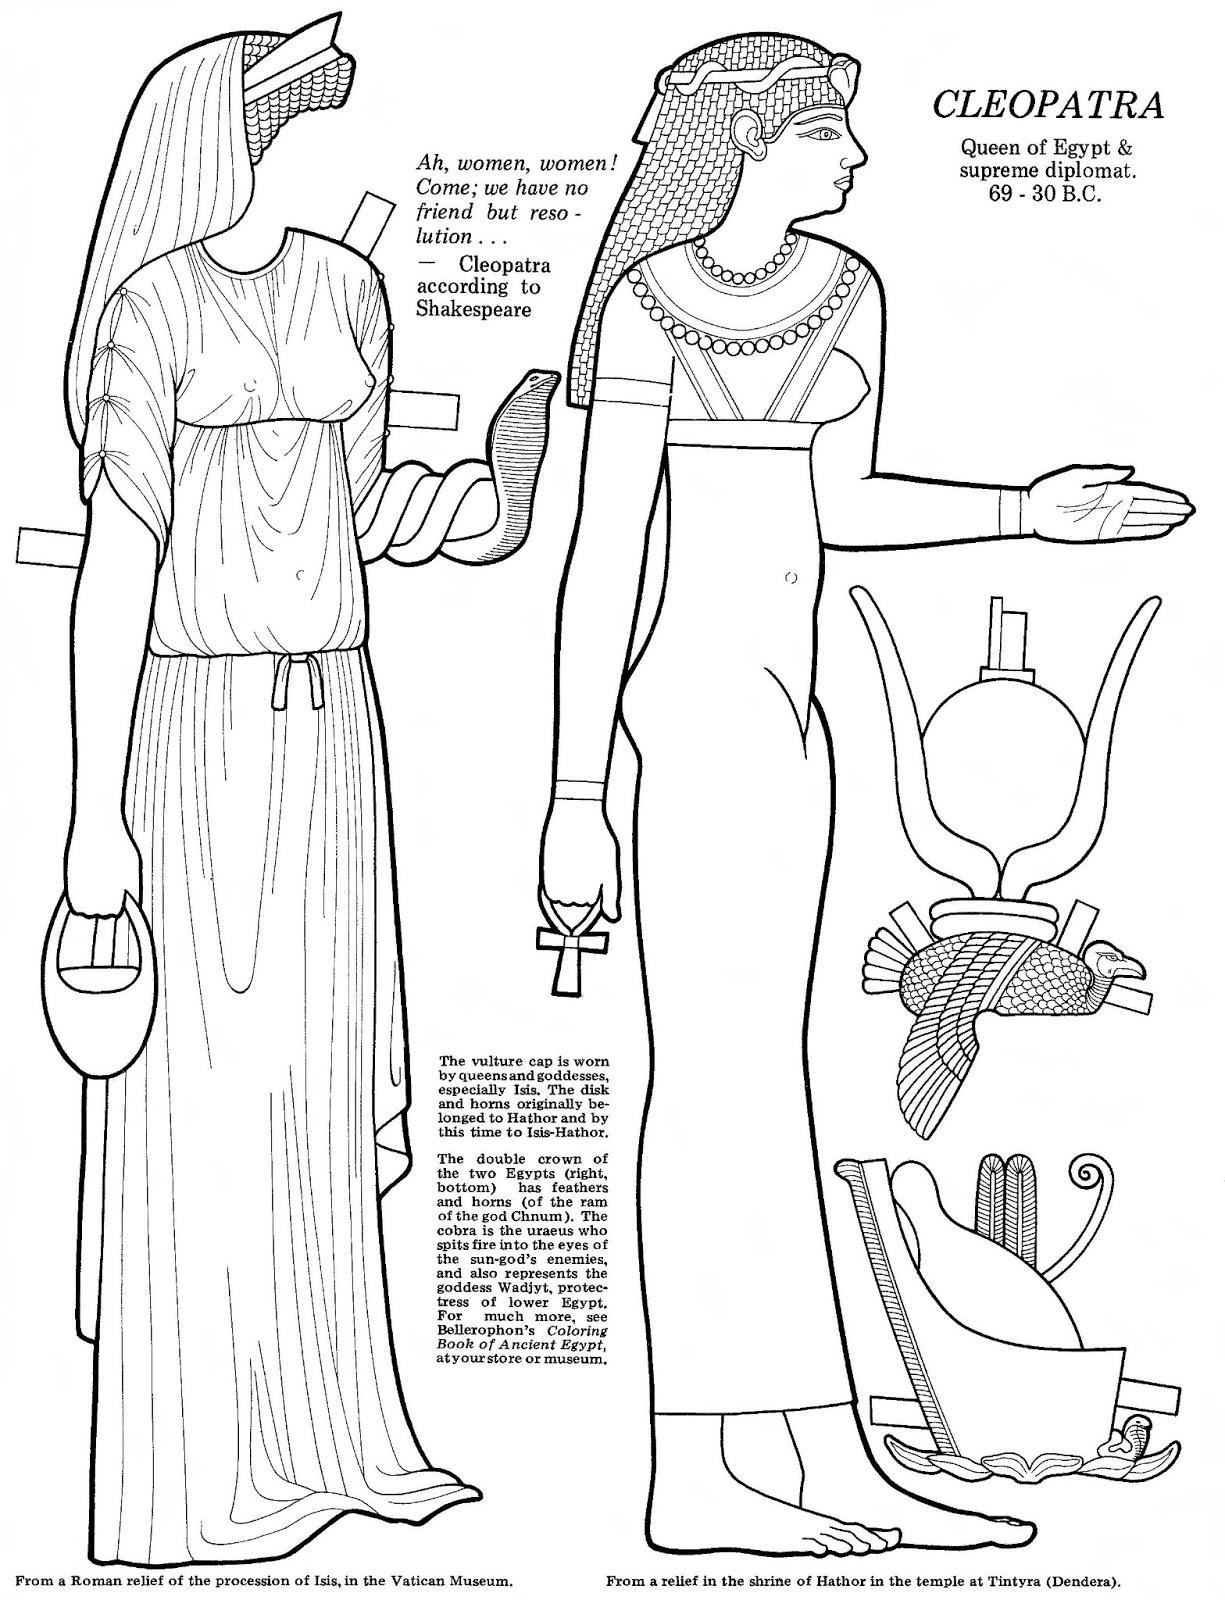 Ancient Egypt Coloring Book Bellerophon Books 5693906 - datu-mo.info